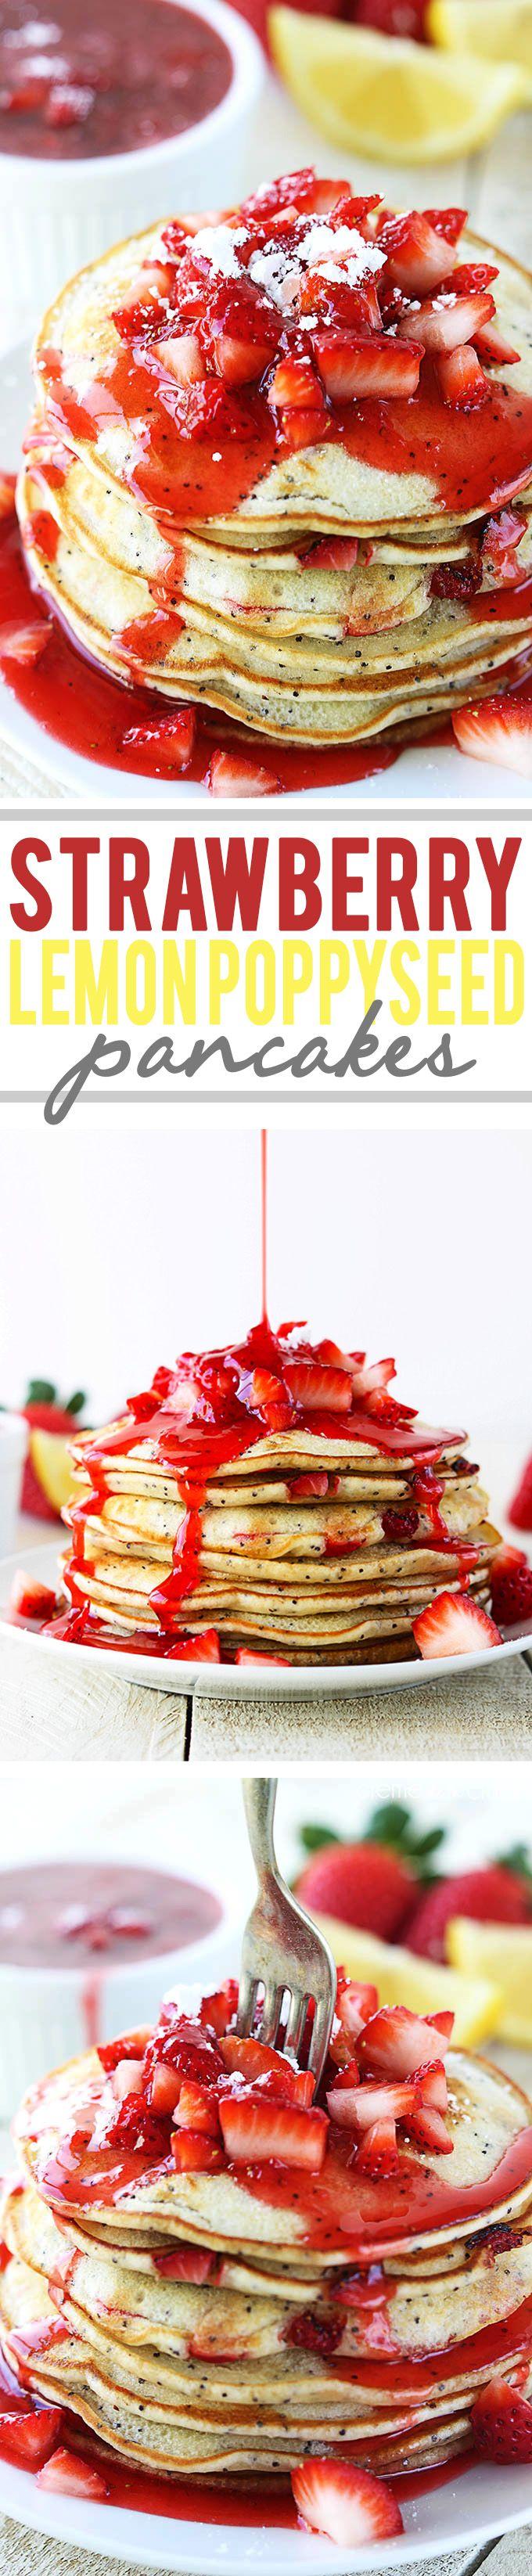 Strawberry & Lemon Poppyseed Pancakes